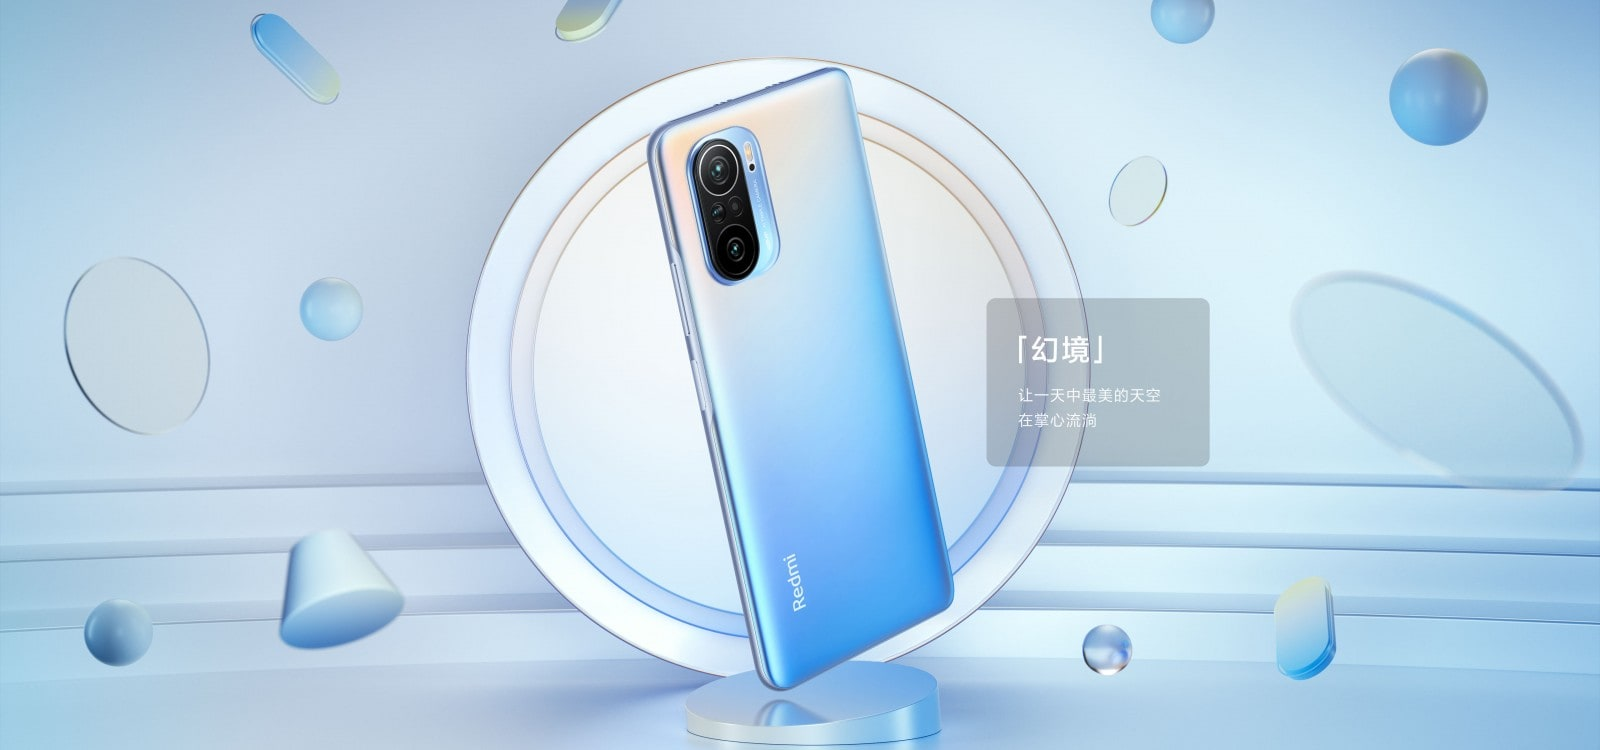 Представлен смартфон Redmi K40 с AMOLED дисплеем 120 Гц и чипом Snapdragon 870